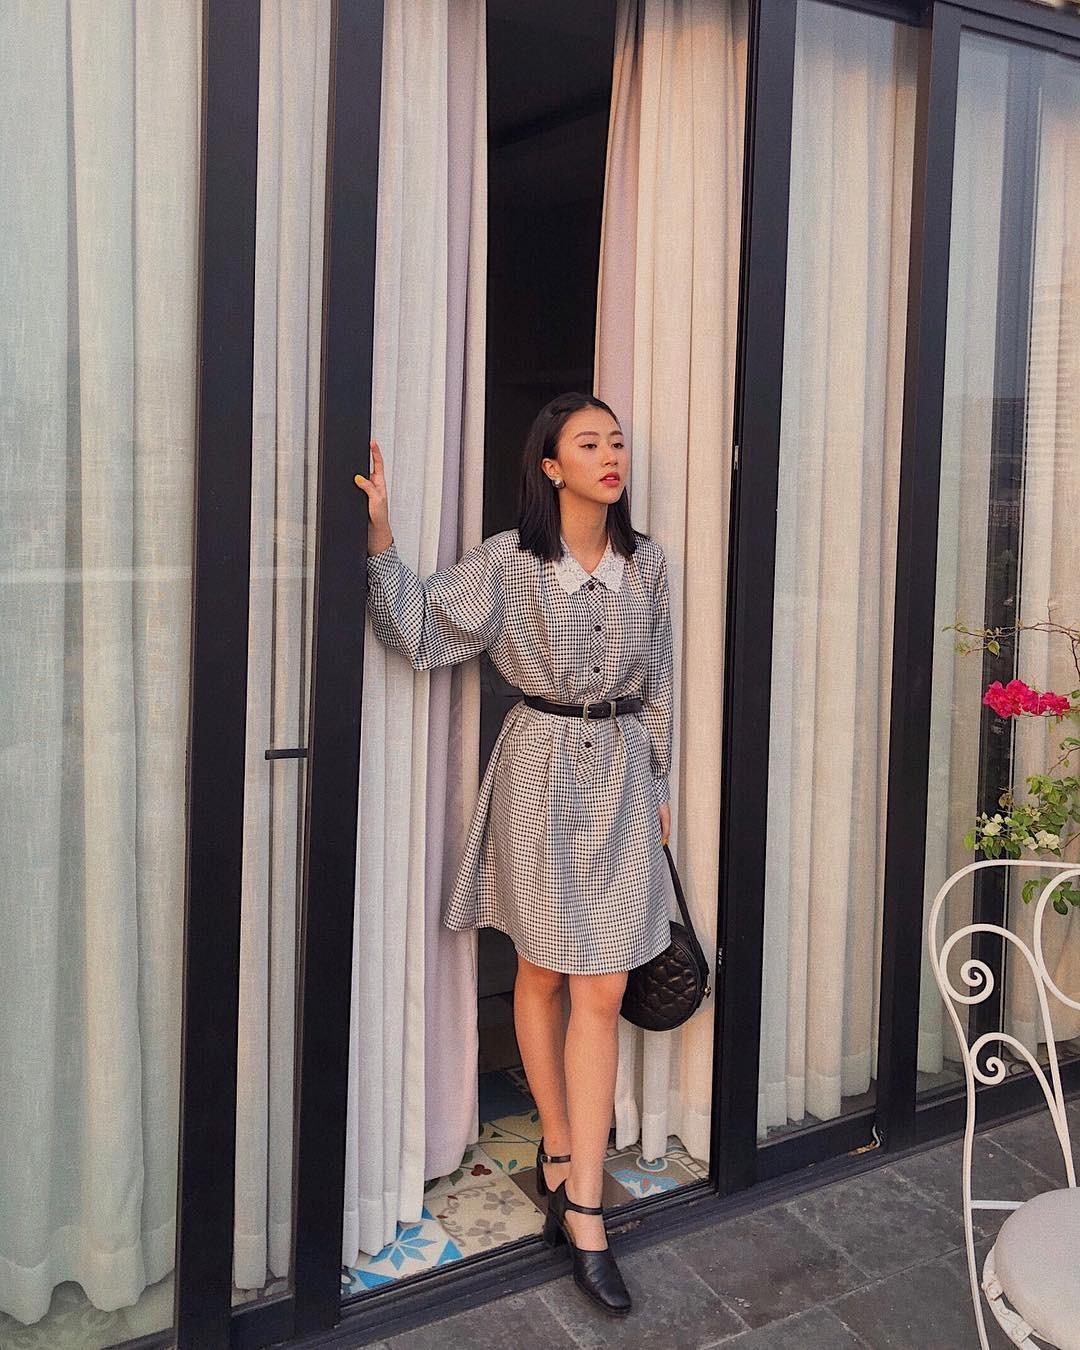 Quynh Anh Shyn - tu hot girl Ha thanh den fashionista co style doc la hinh anh 11 QAS14.jpg